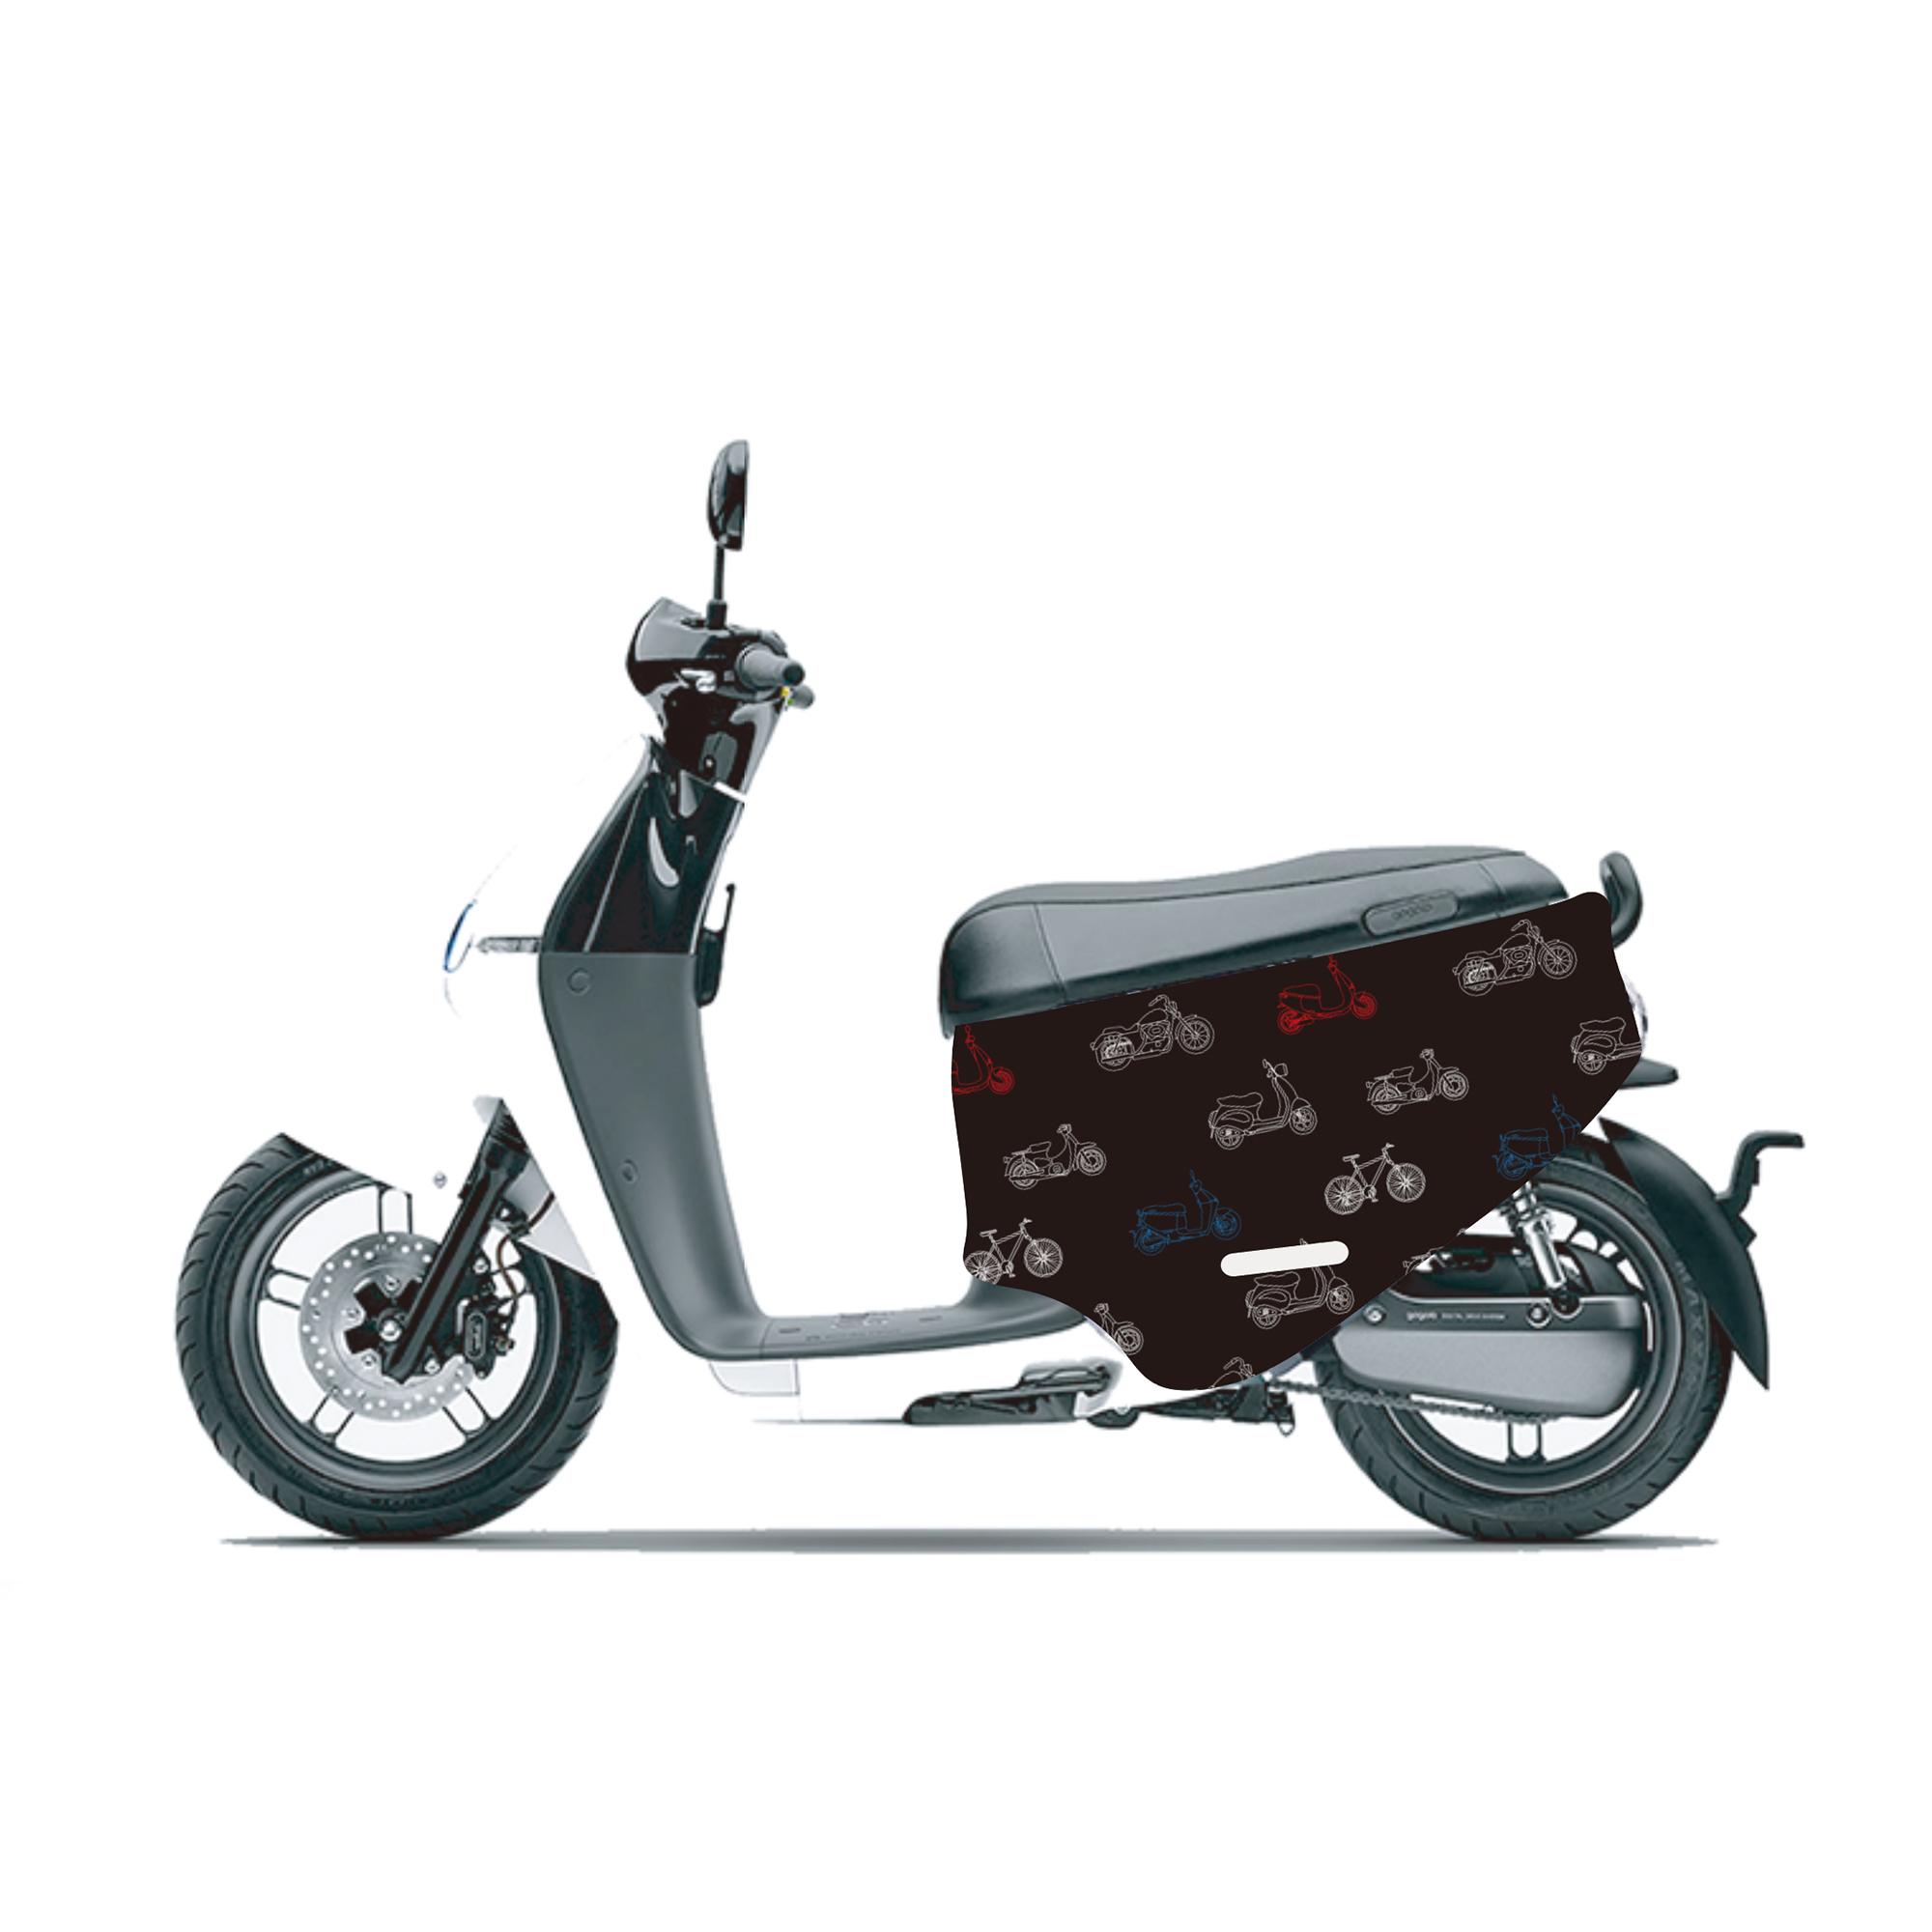 BLR gogoro ID84 雙輪集合 雙面車套 車身防刮套 潛水衣布 防刮套 保護套 車套 機車配備 電動車防刮 智慧雙輪